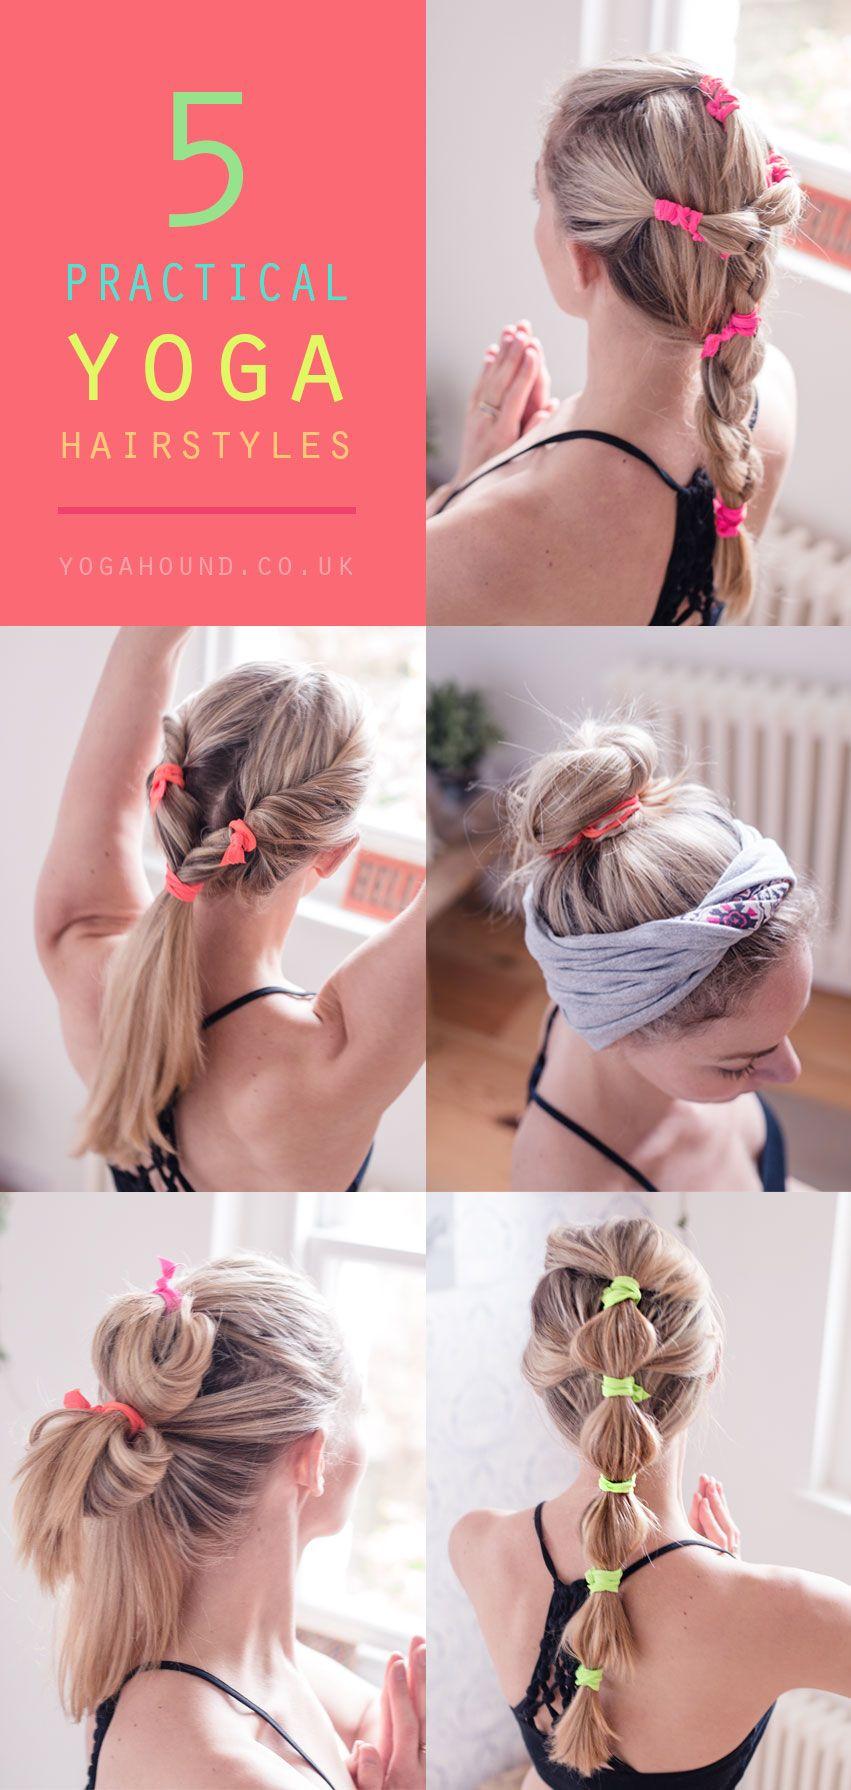 Yoga hairstyles #yogahair #yoga #hairstyles ...